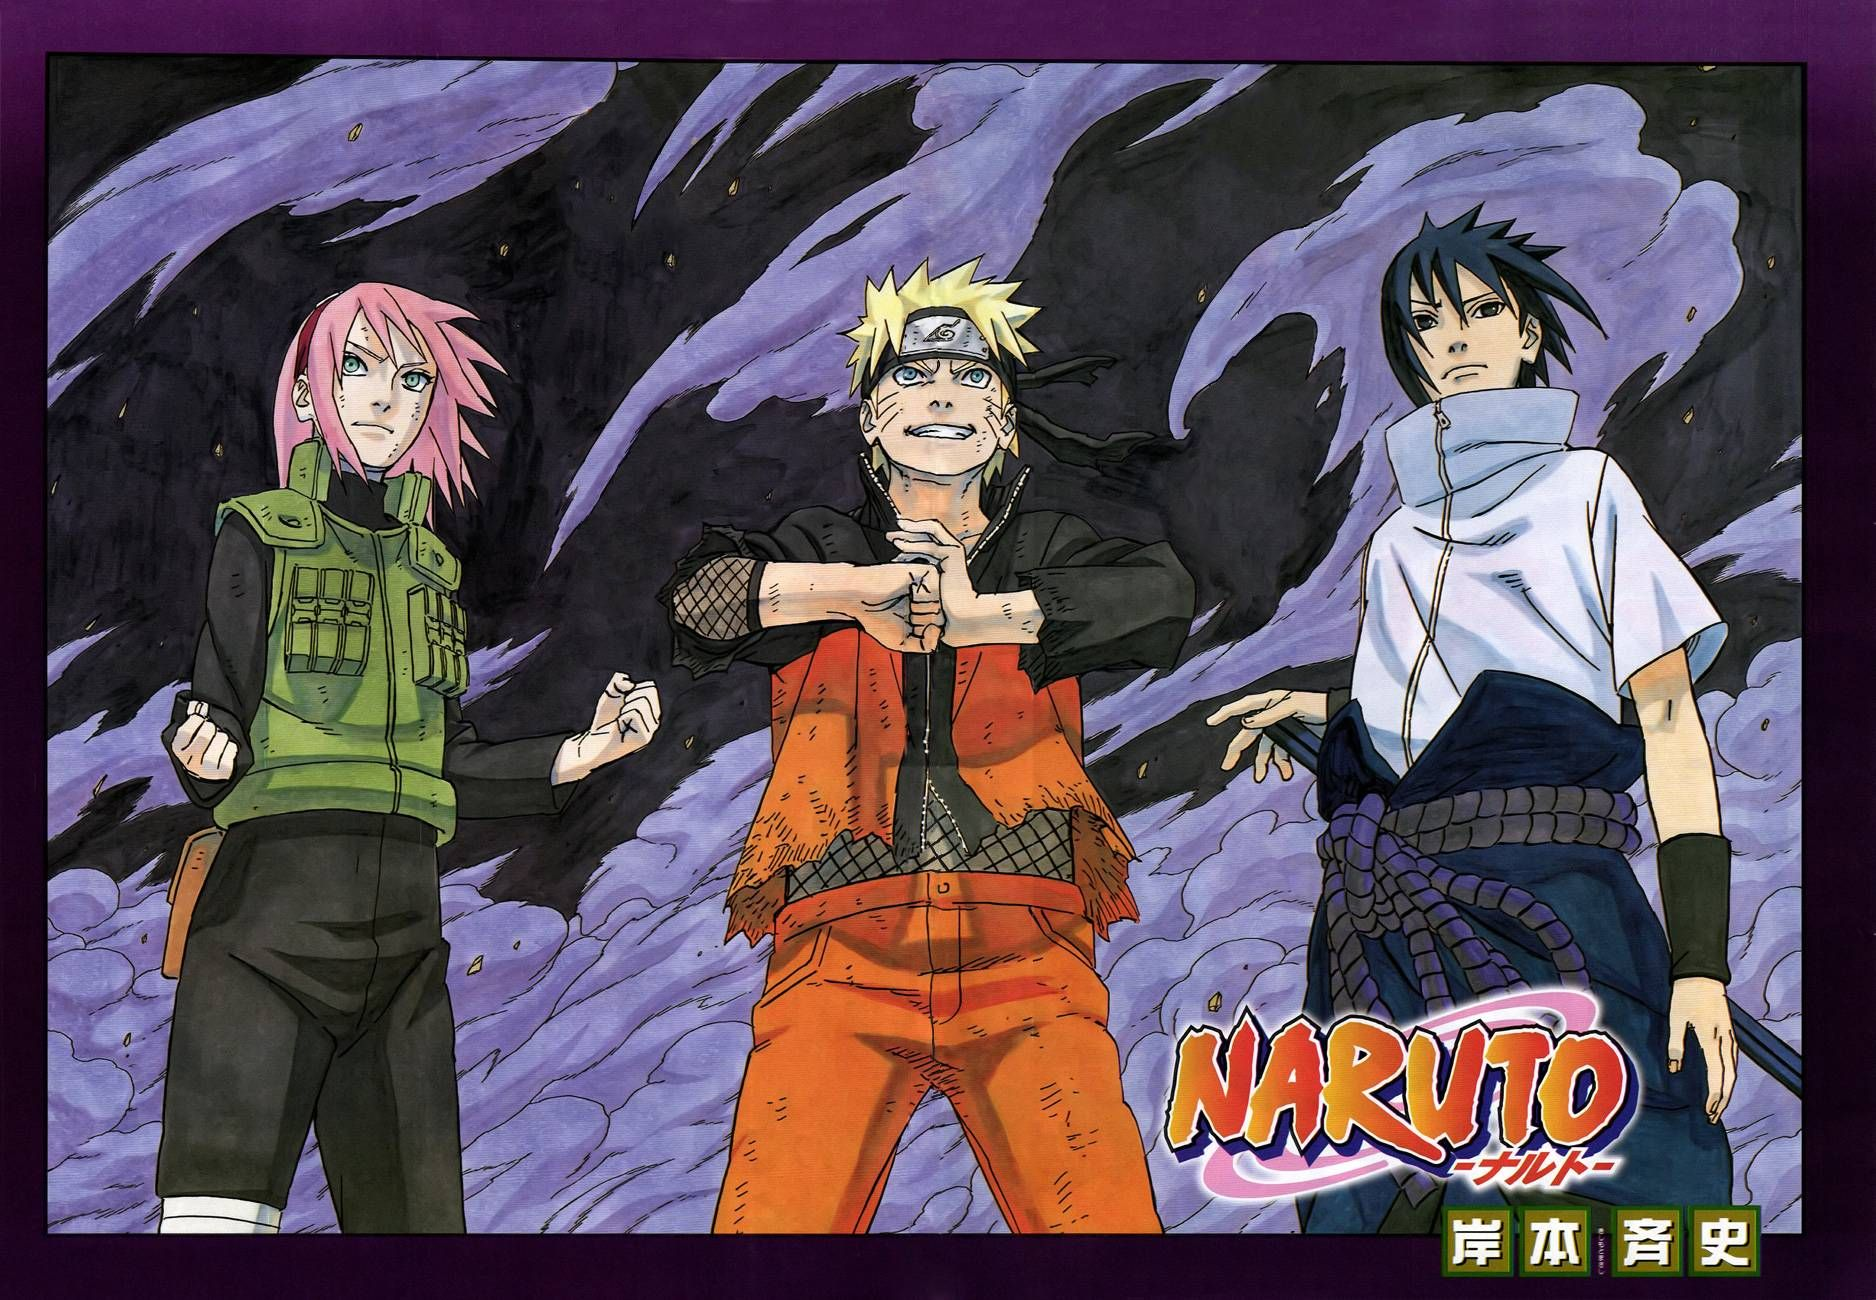 Naruto Shippuden Team 7 Reunites Again Naruto Wallpaper With